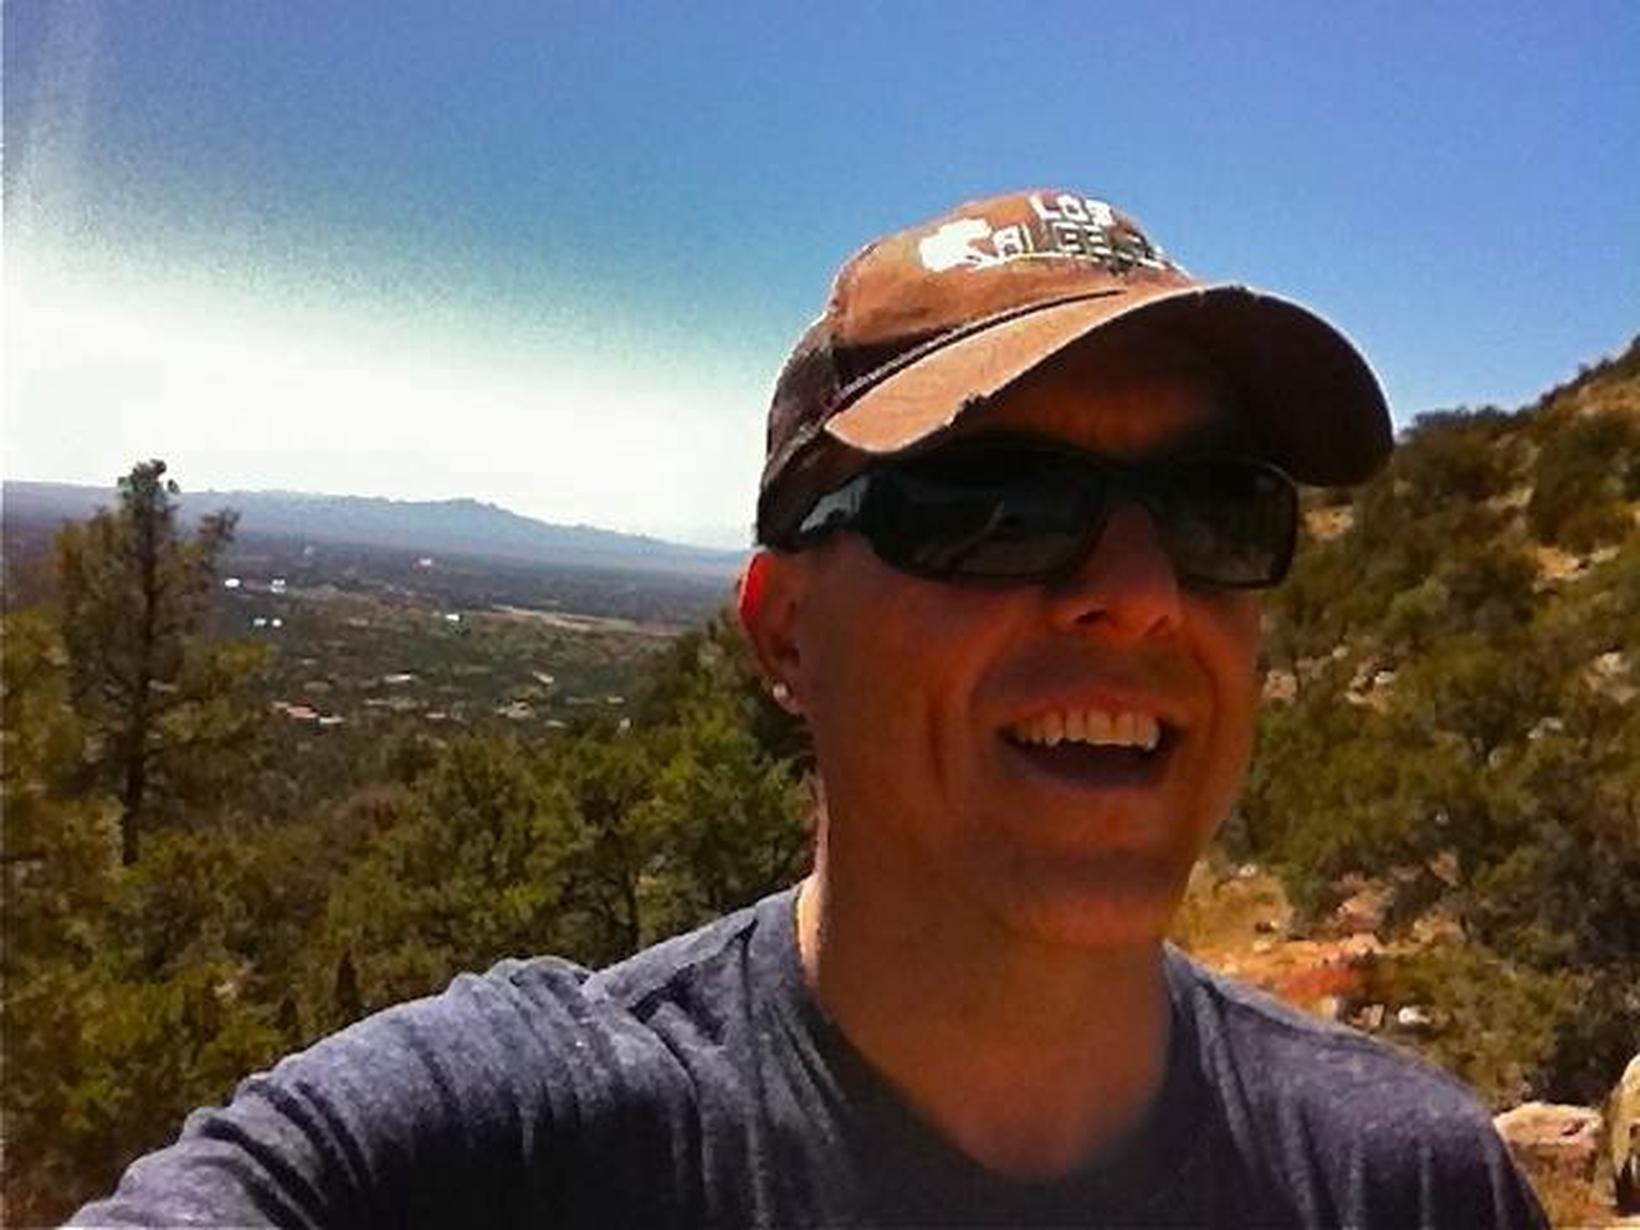 Tom from Santa Fe, New Mexico, United States